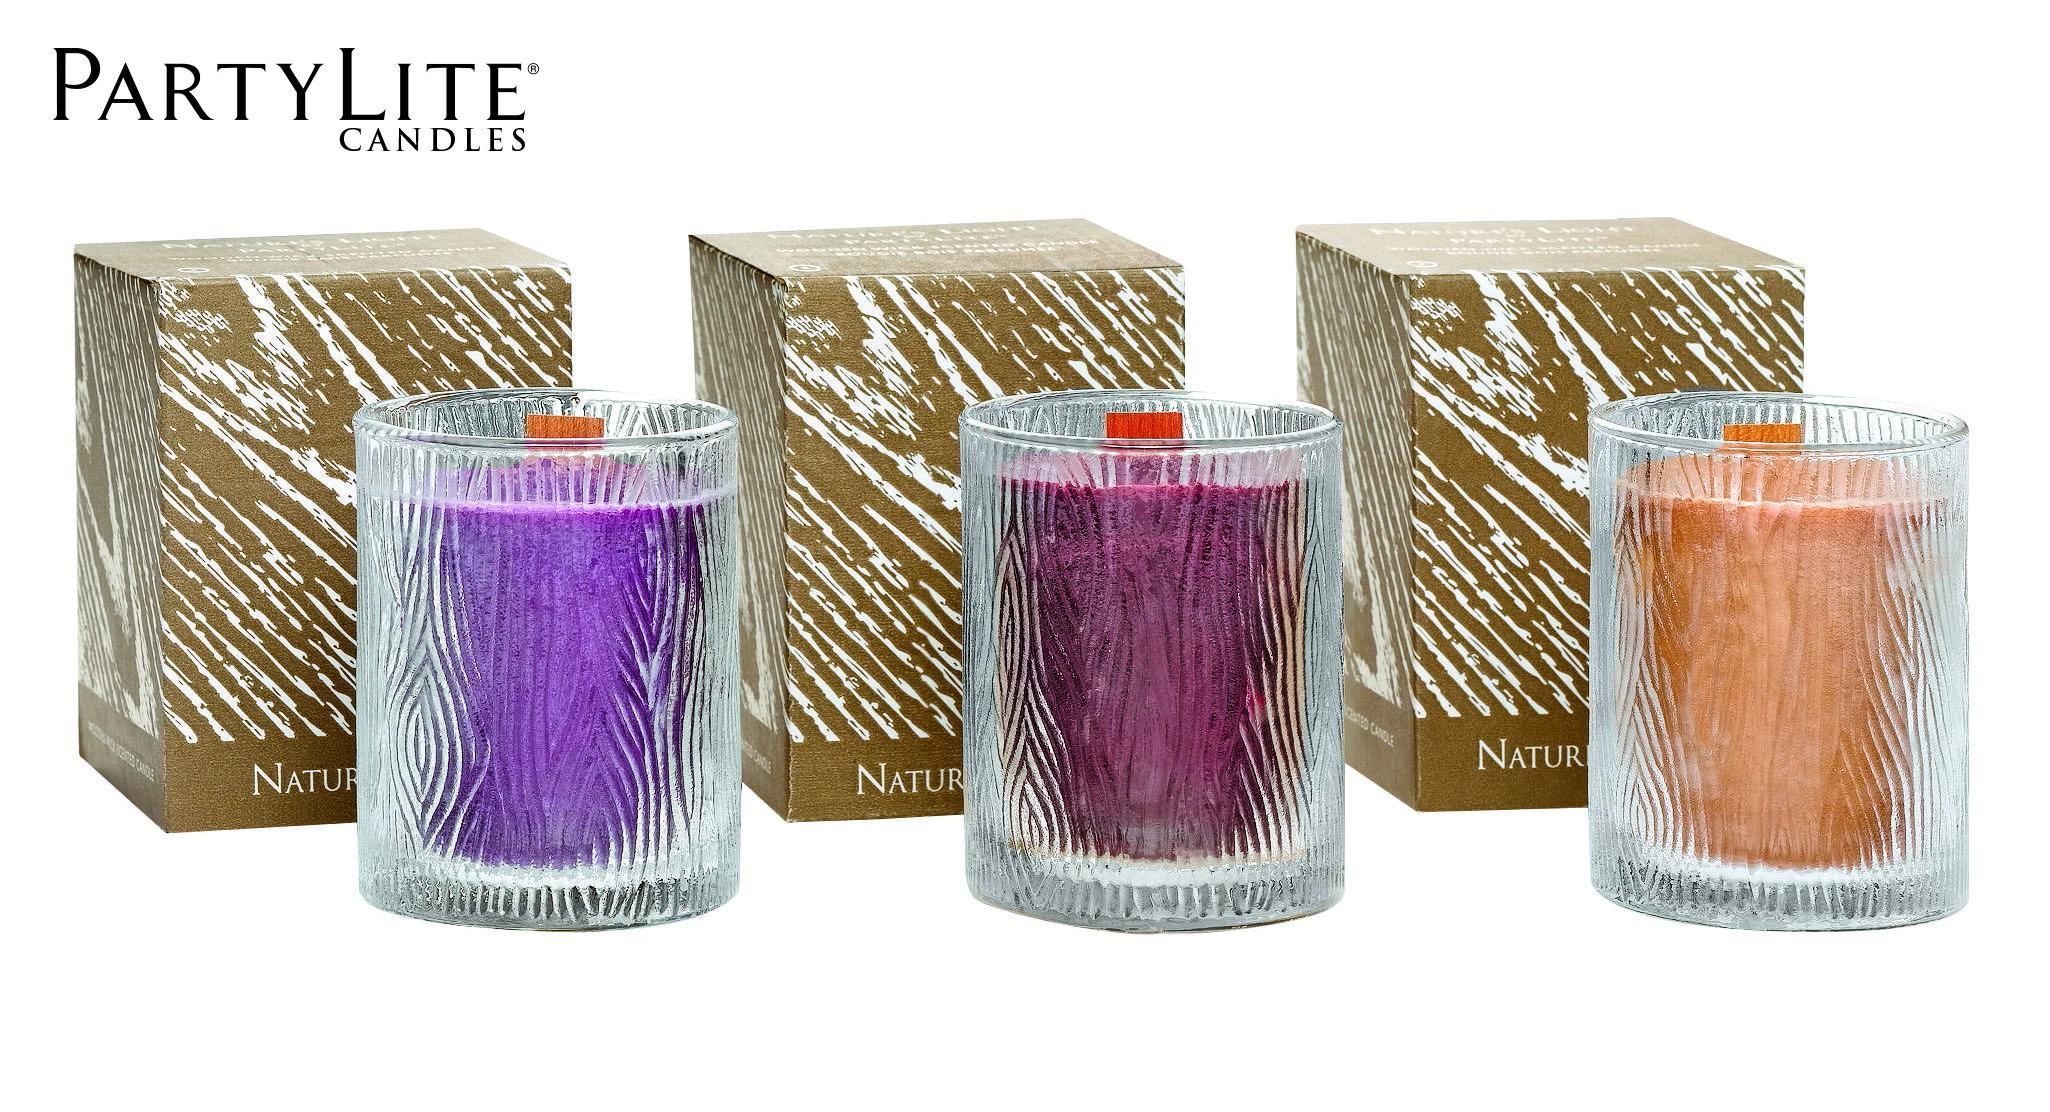 pots bougie nature 39 s light by partylite aussi. Black Bedroom Furniture Sets. Home Design Ideas